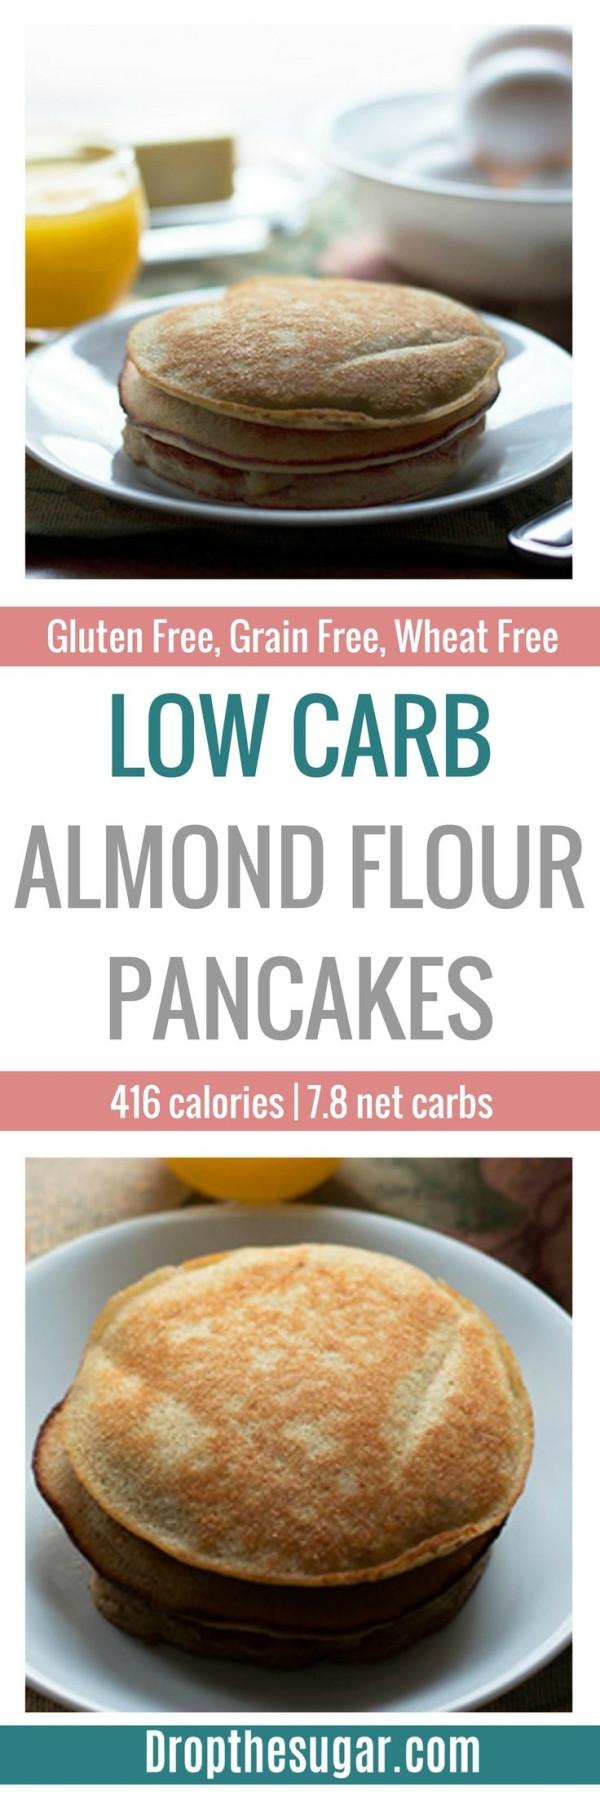 Low Carb Almond Flour Pancakes  Low Carb Almond Flour Pancakes